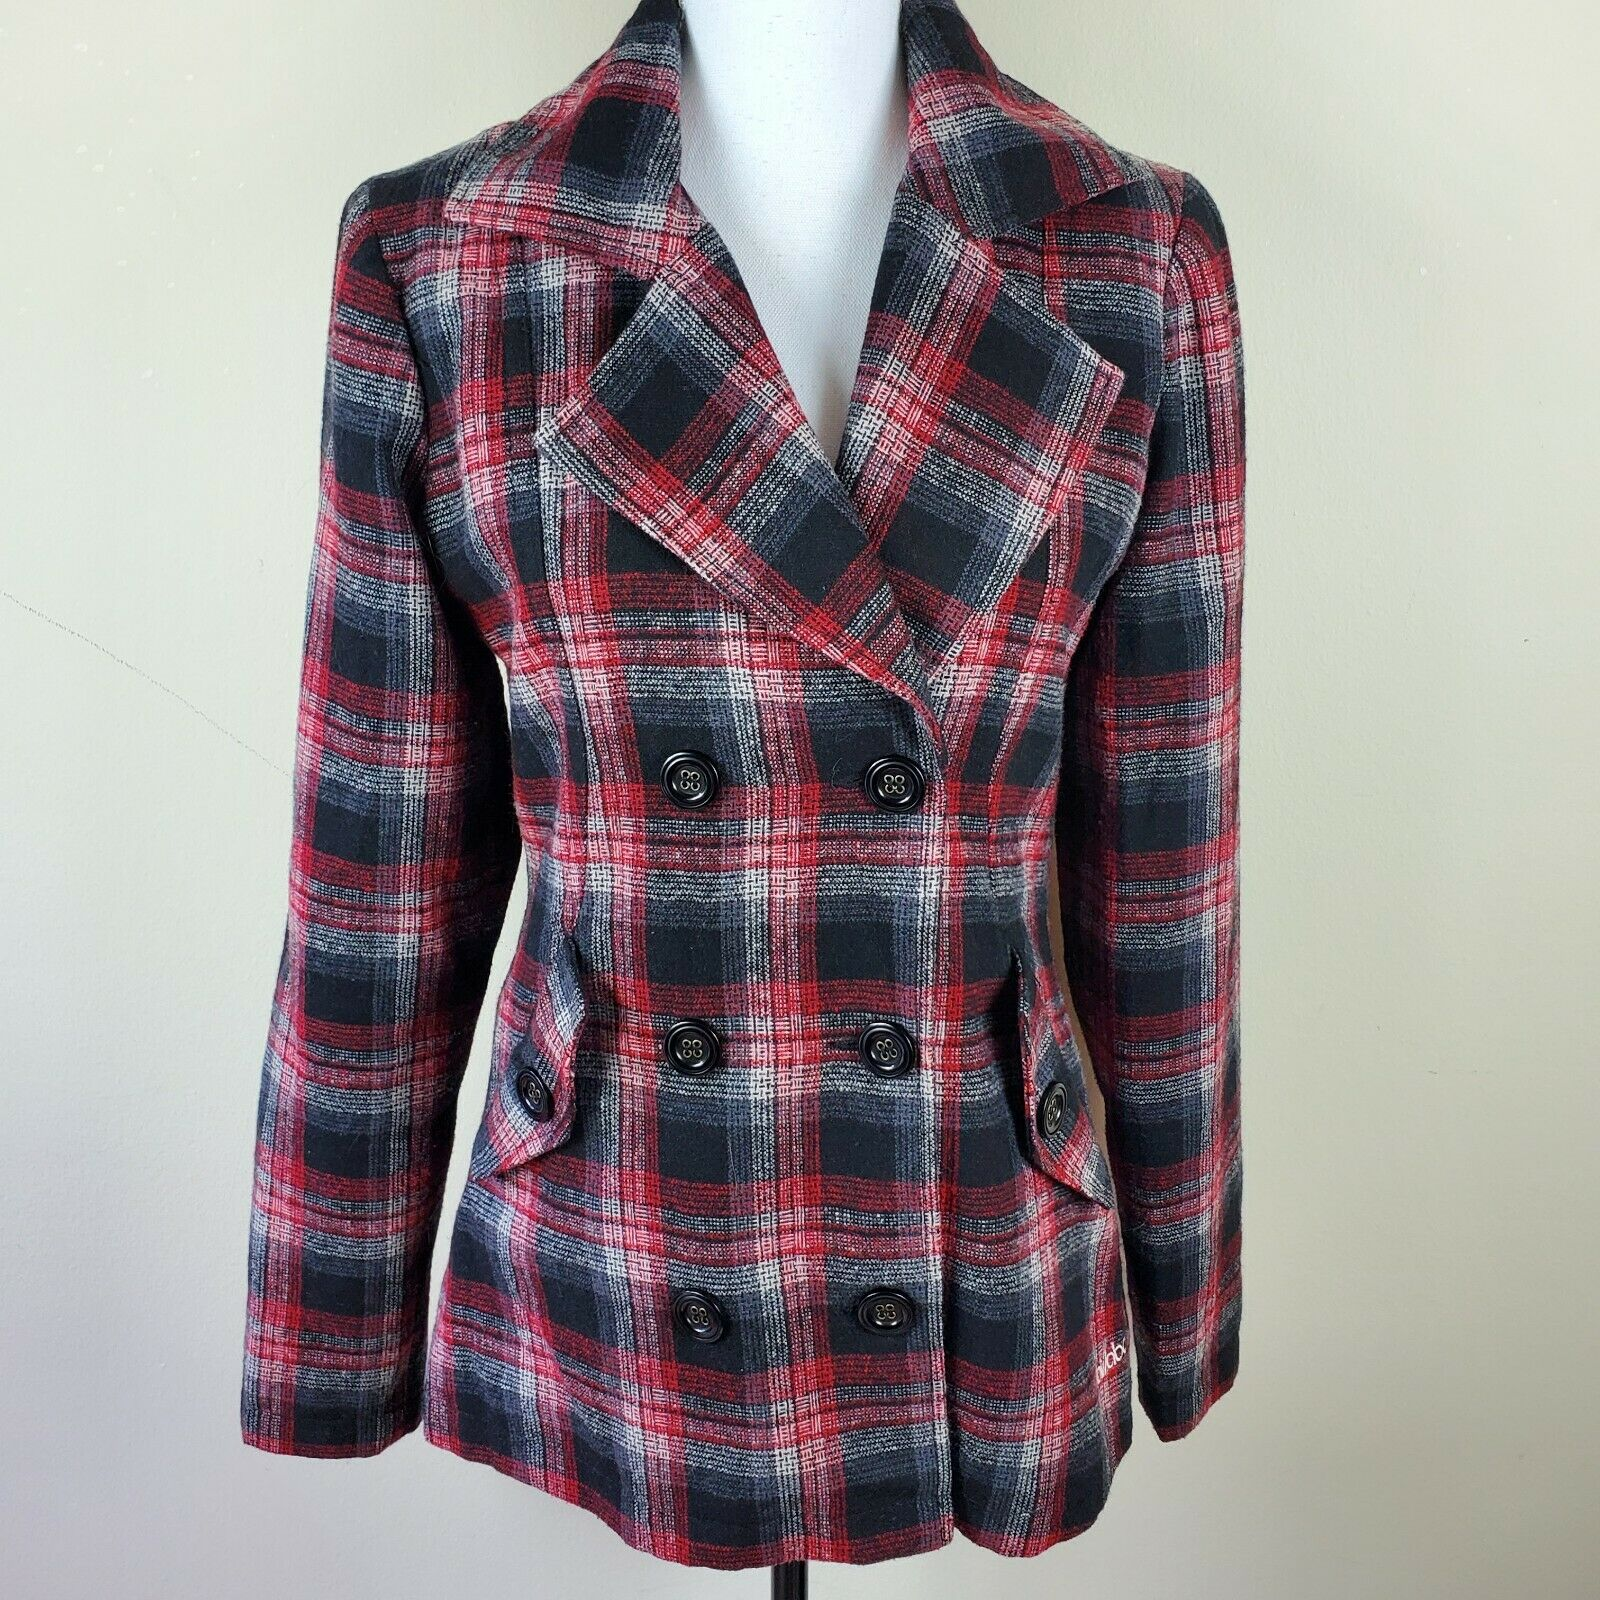 BILLABONG Red Black Wool Blend Plaid Jacket Coat Women's Size L